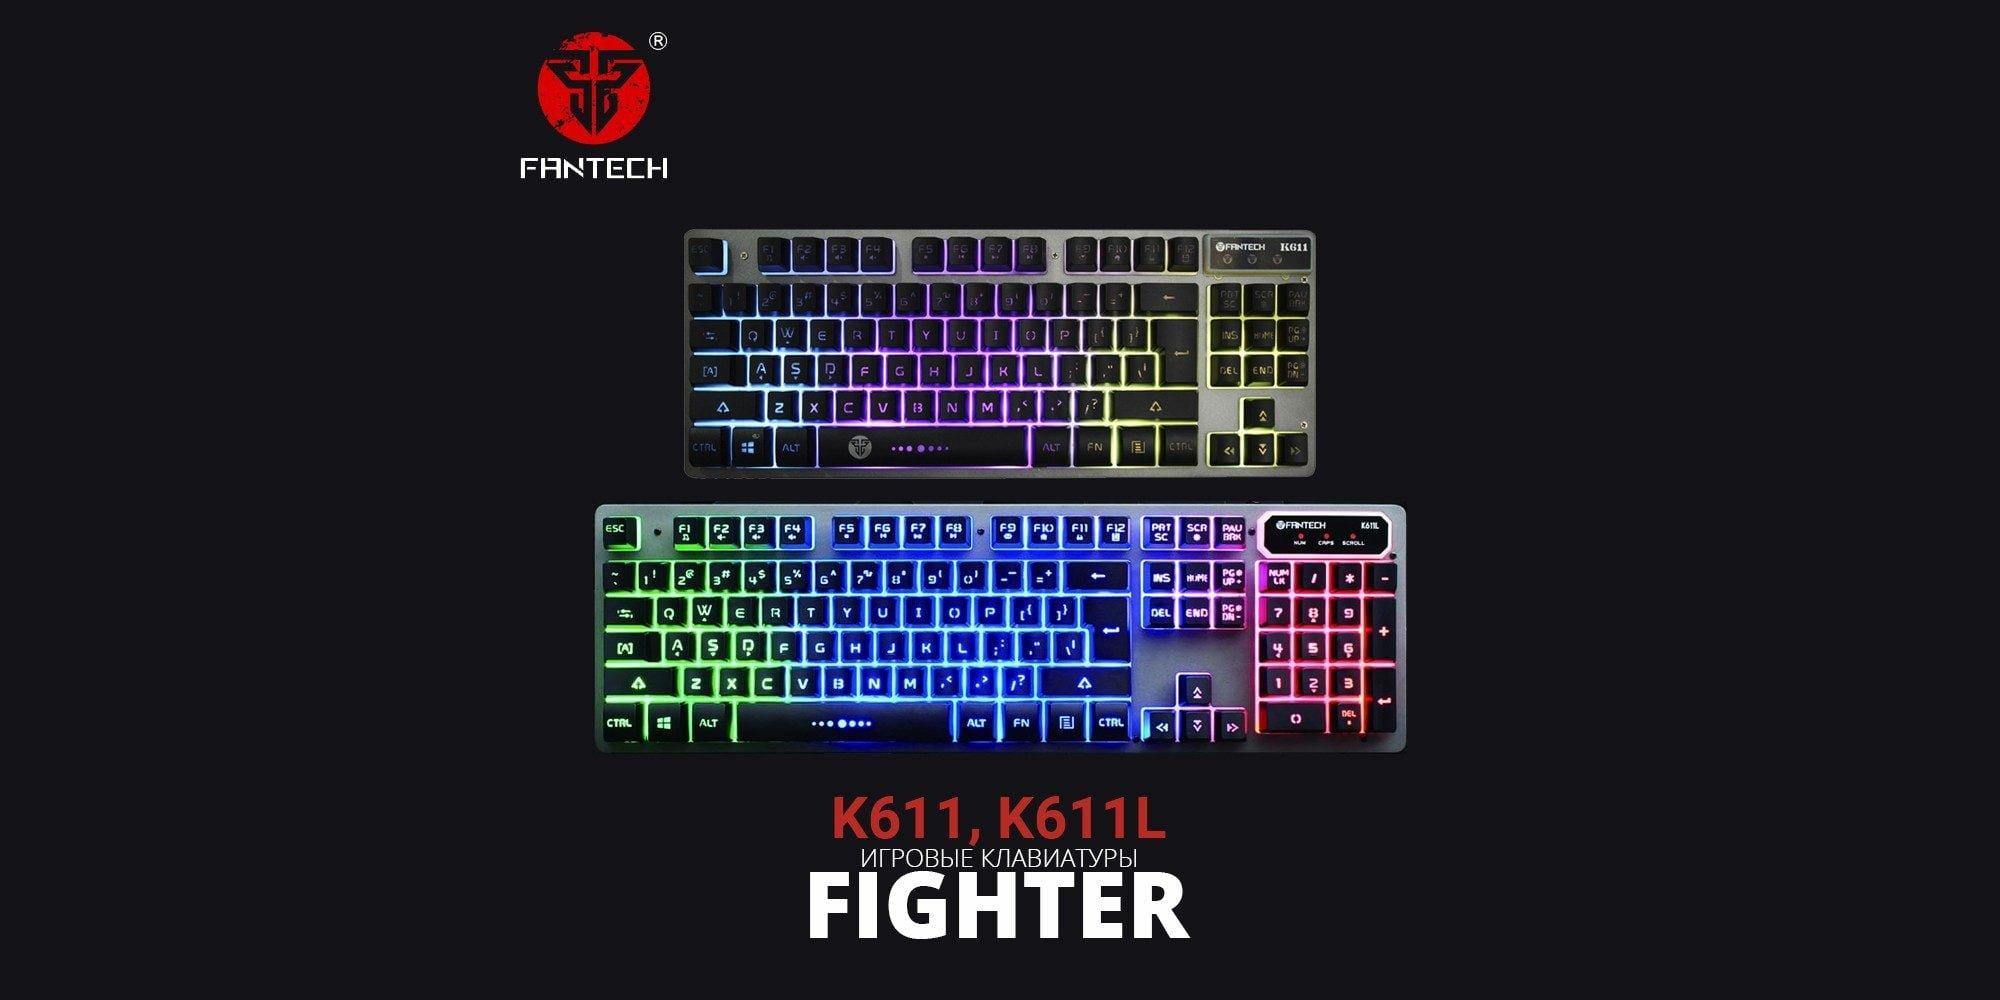 Игровые клавиатуры Fantech Fighter K611 и Fantech Fighter K611L